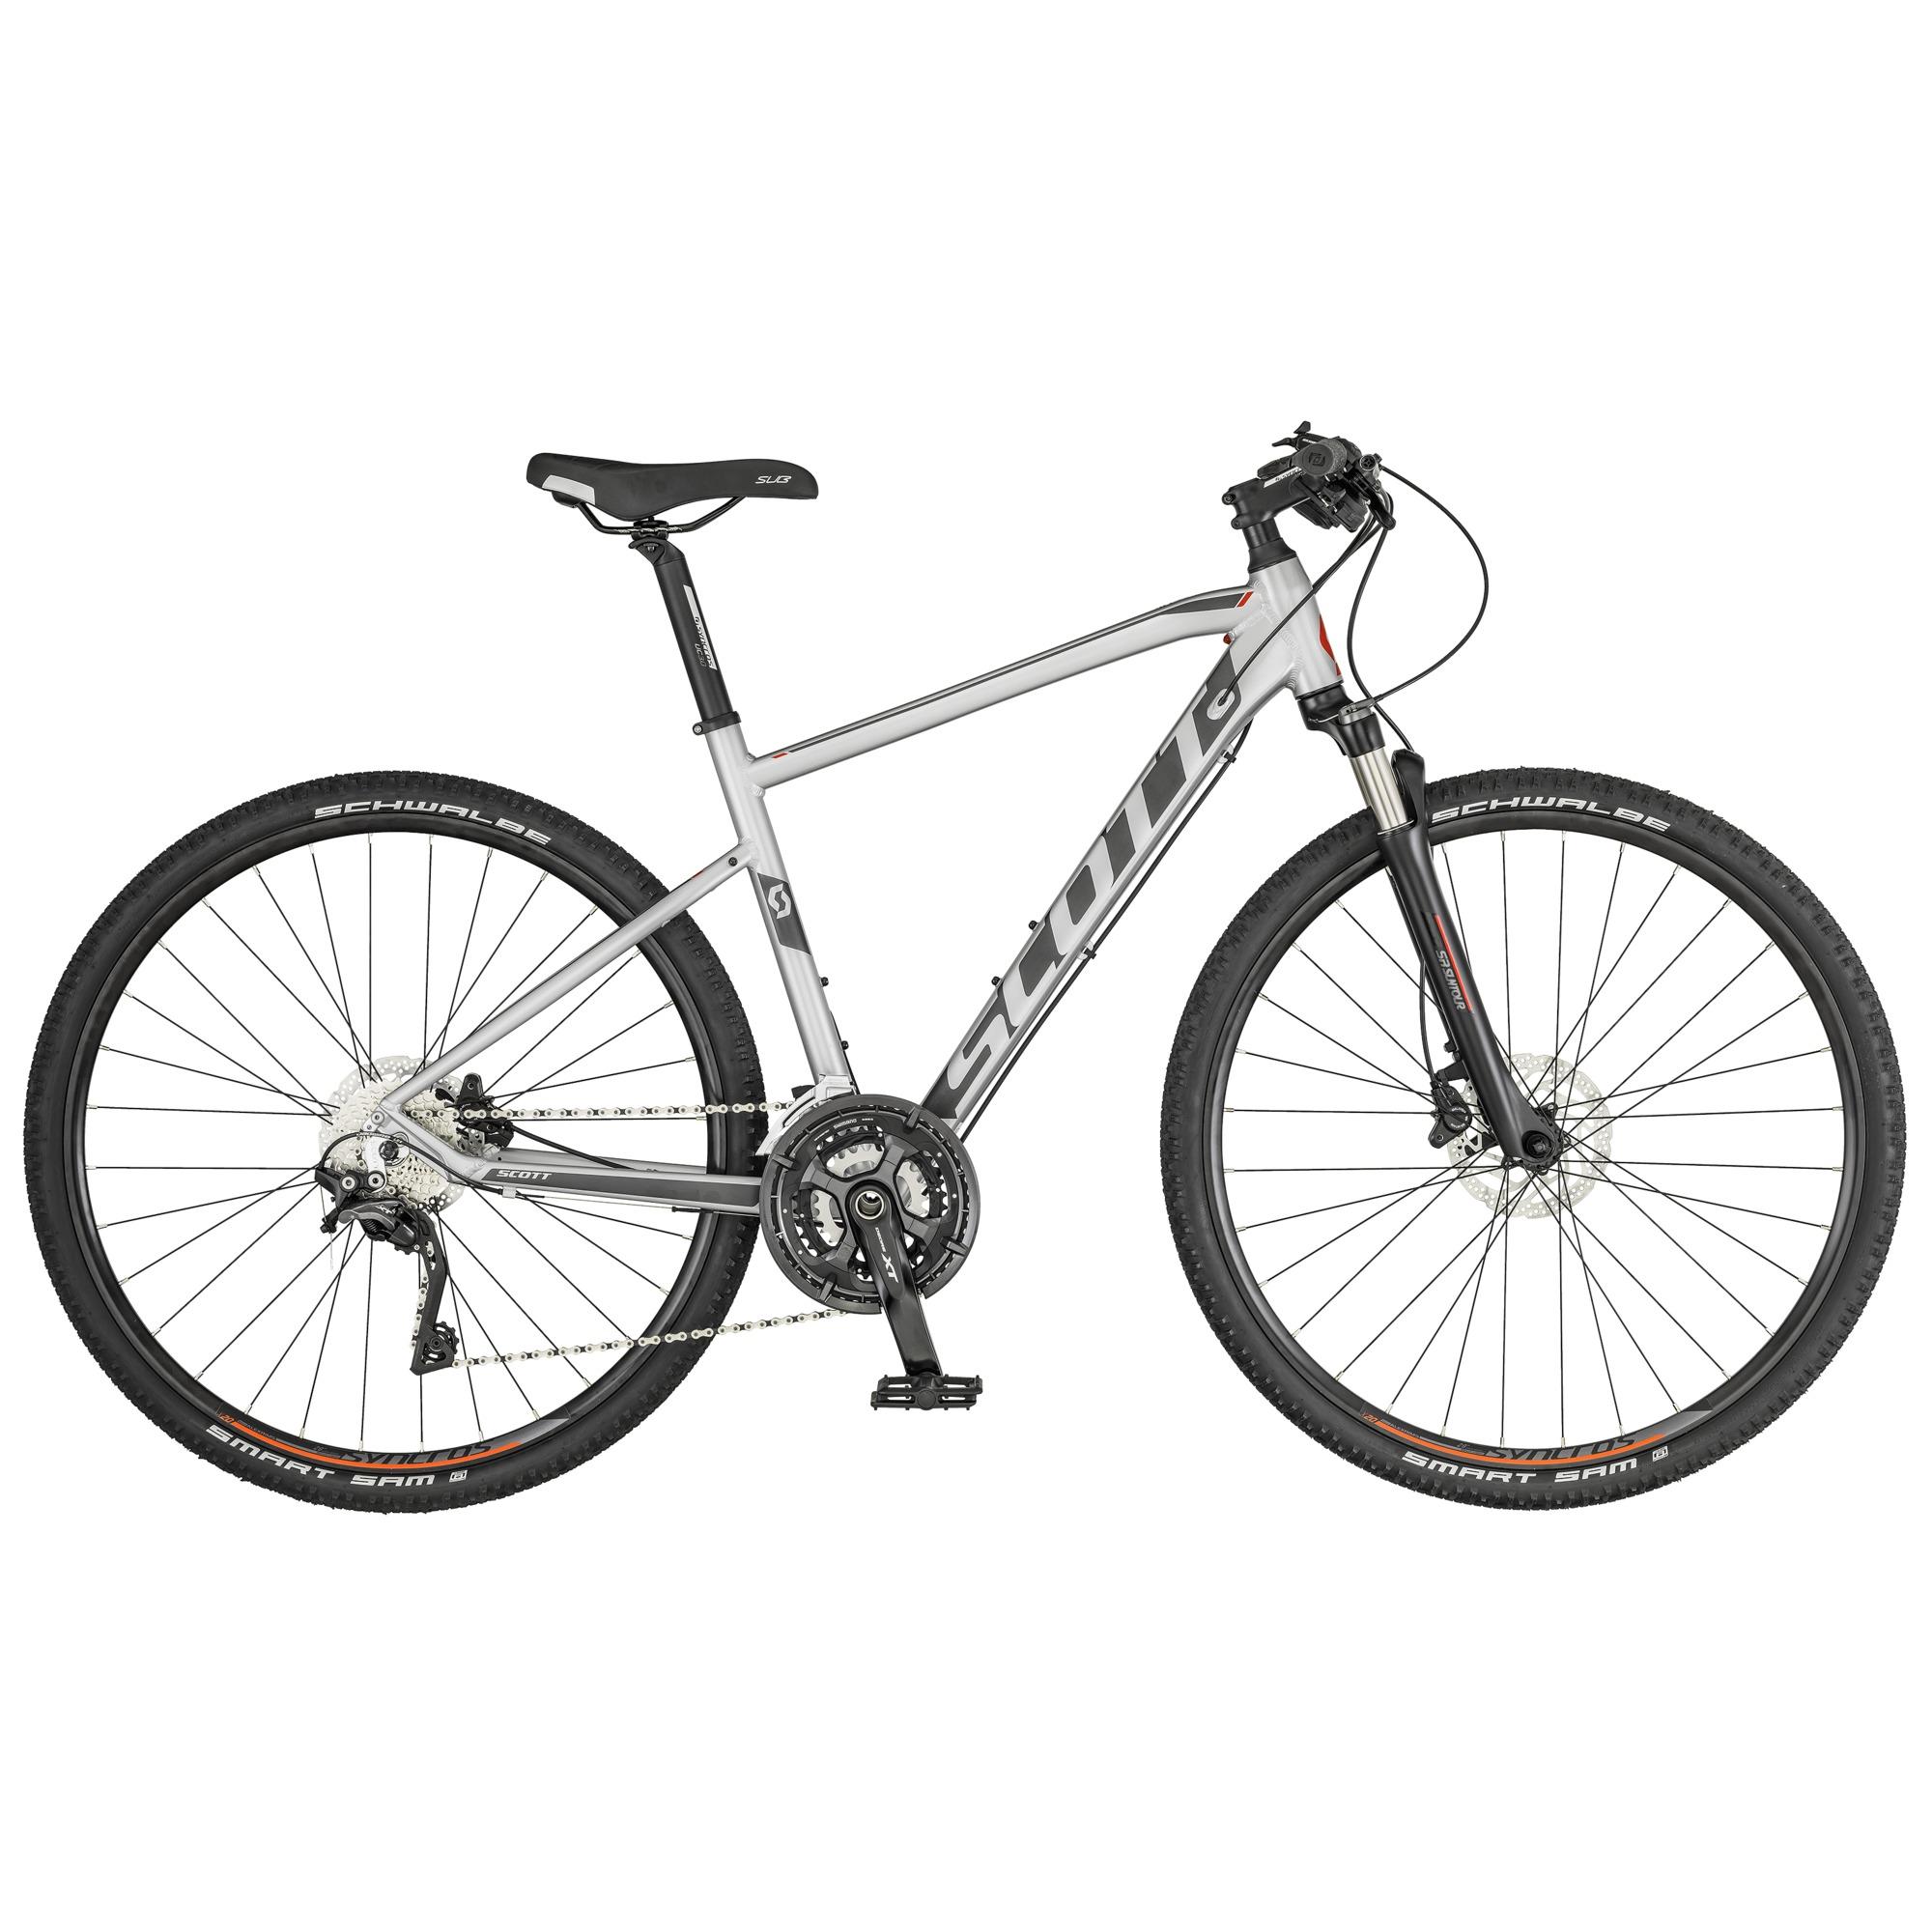 SCOTT Sub Cross 10 Men Fahrrad L - Fahrrad online kaufen | Online Shop Bike Profis